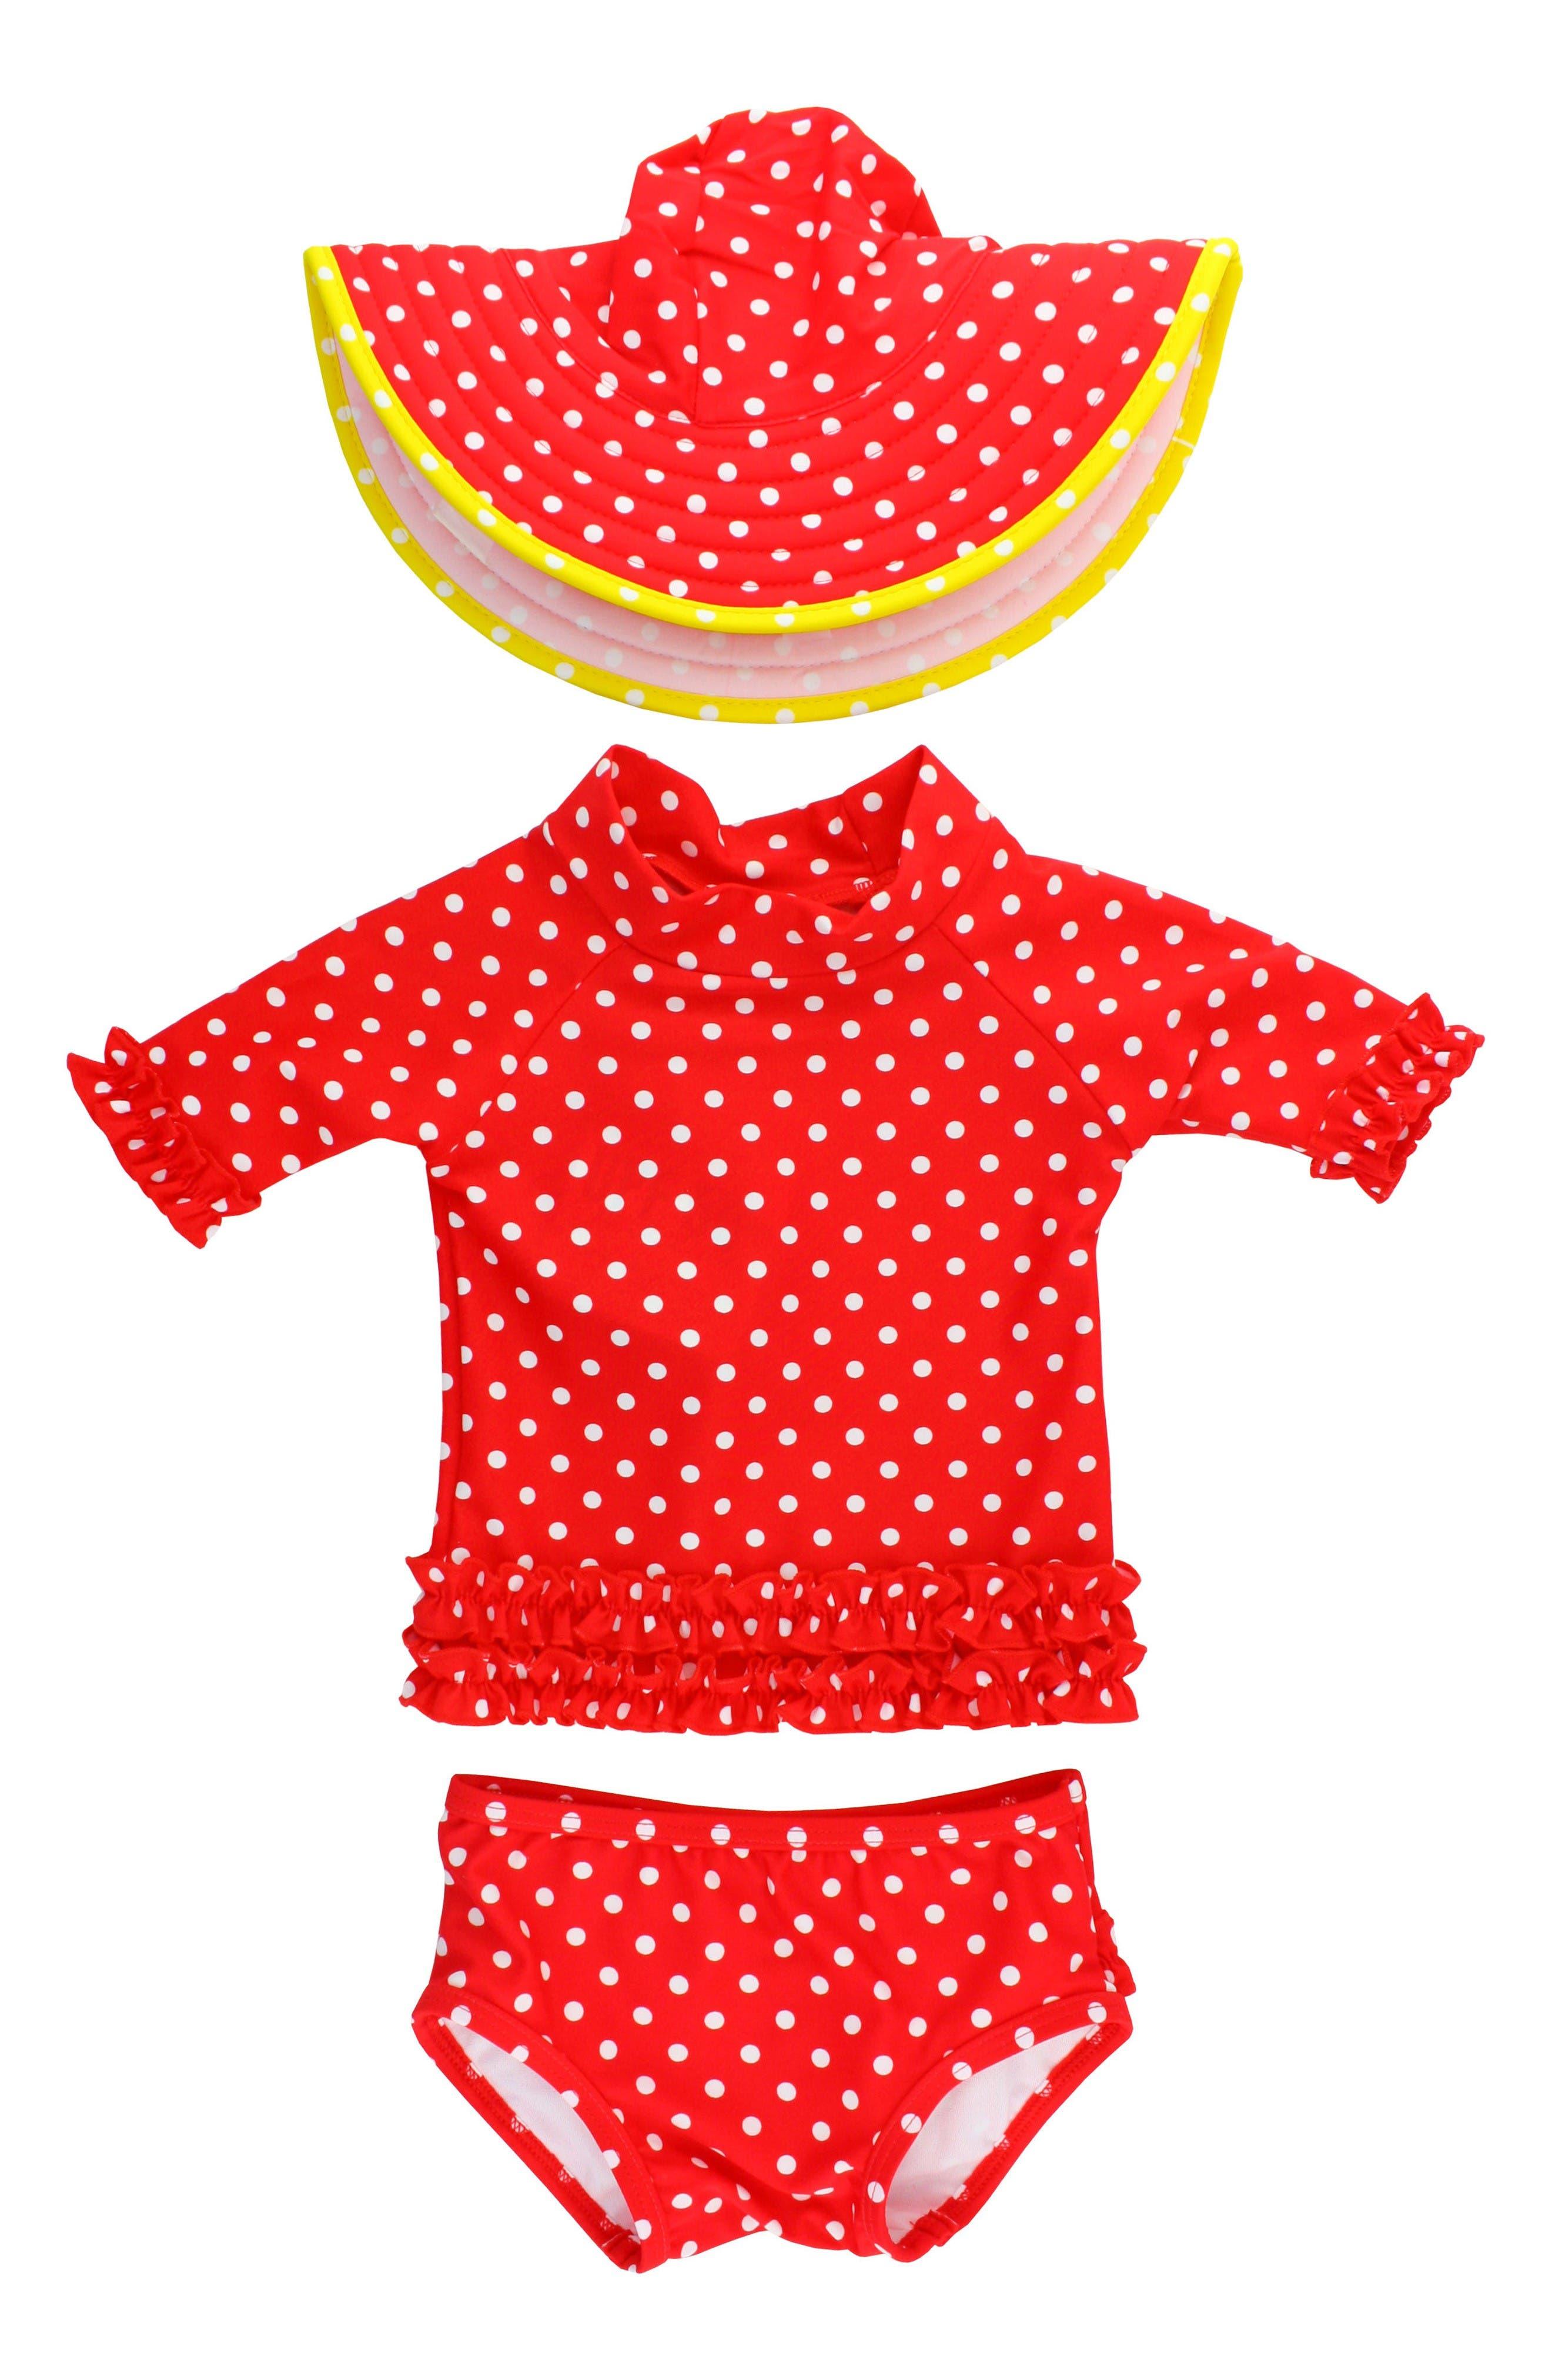 Main Image - RuffleButts Two-Piece Rashguard Swimsuit & Hat Set (Toddler Girls)